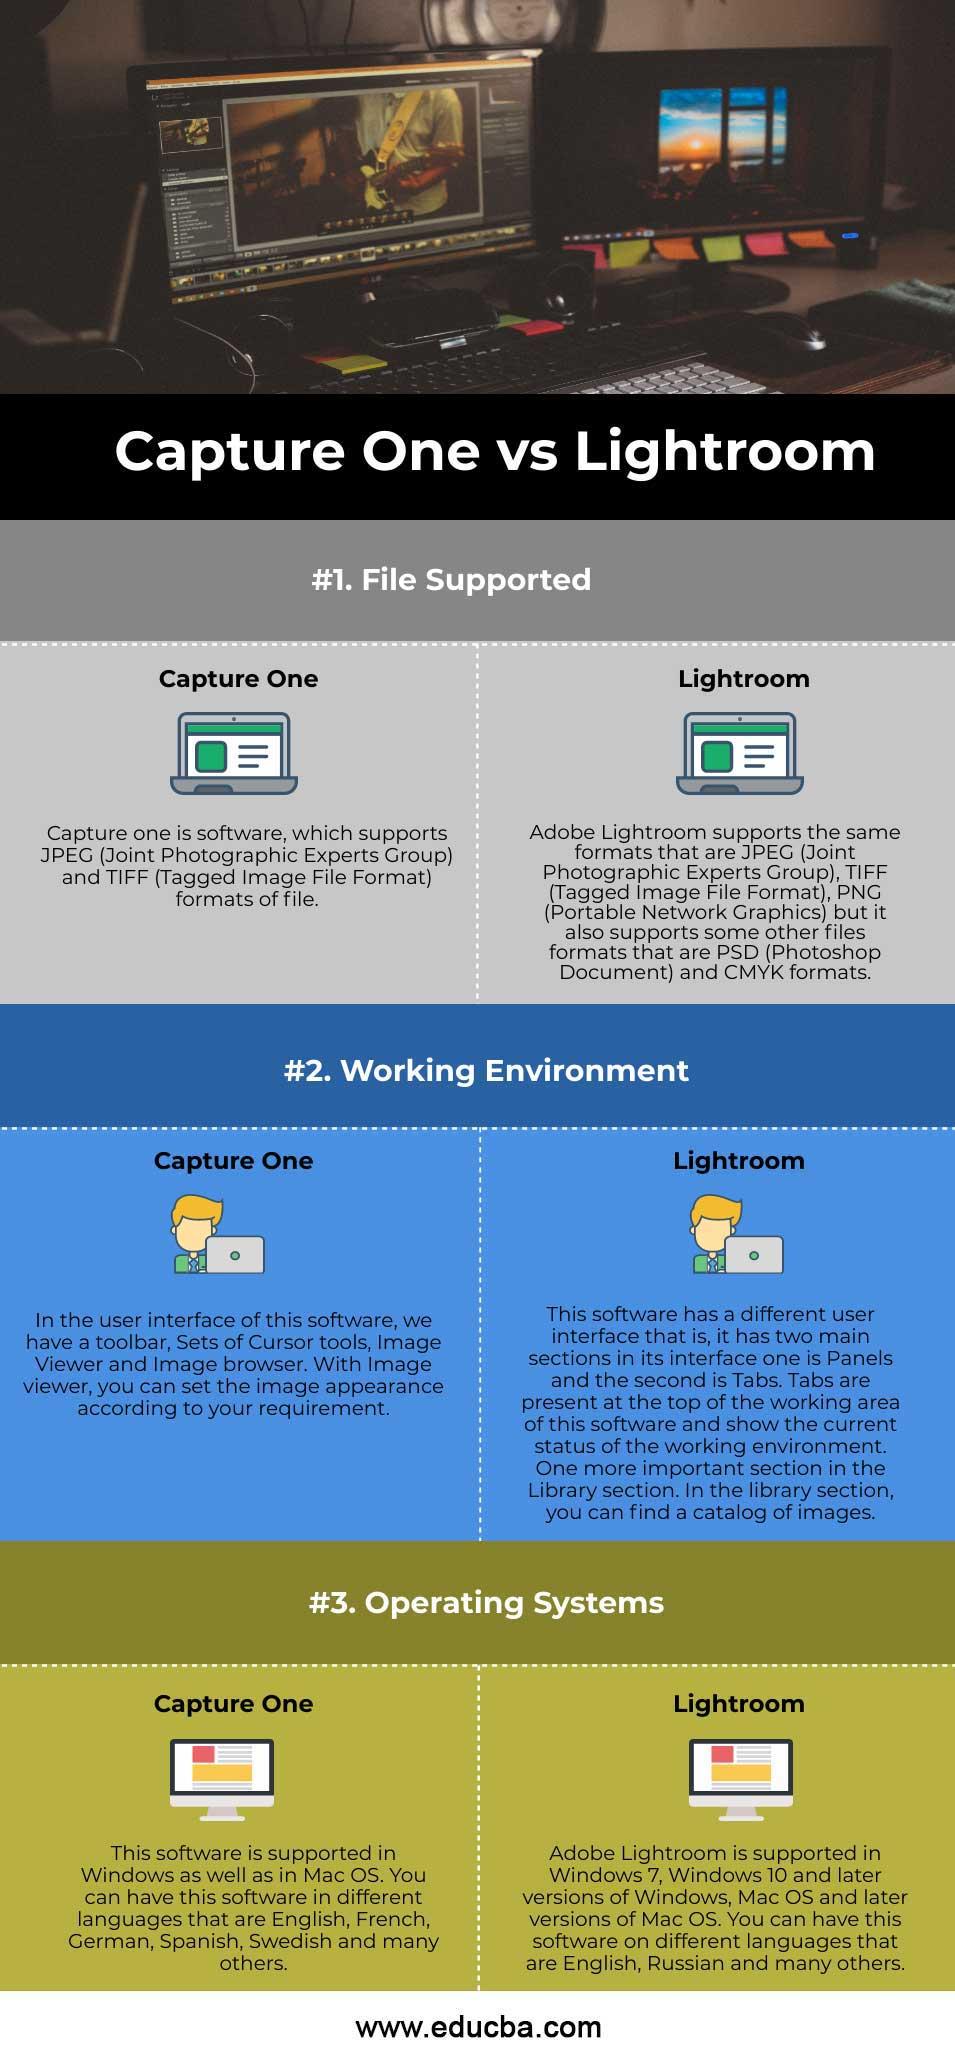 Capture One vs Lightroom info